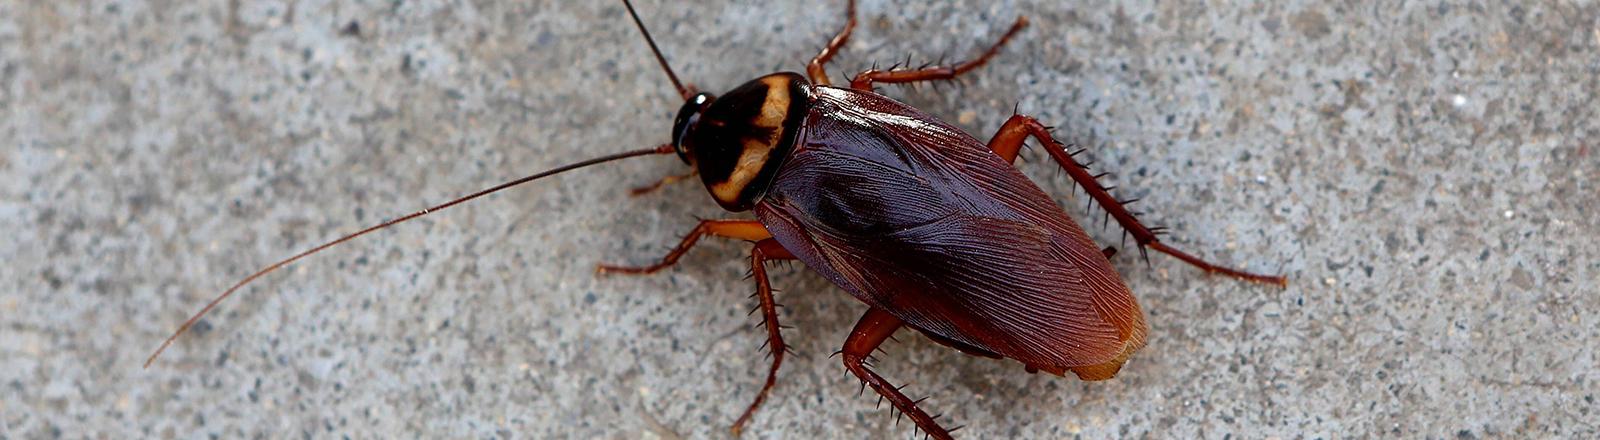 Eine Kakerlake.